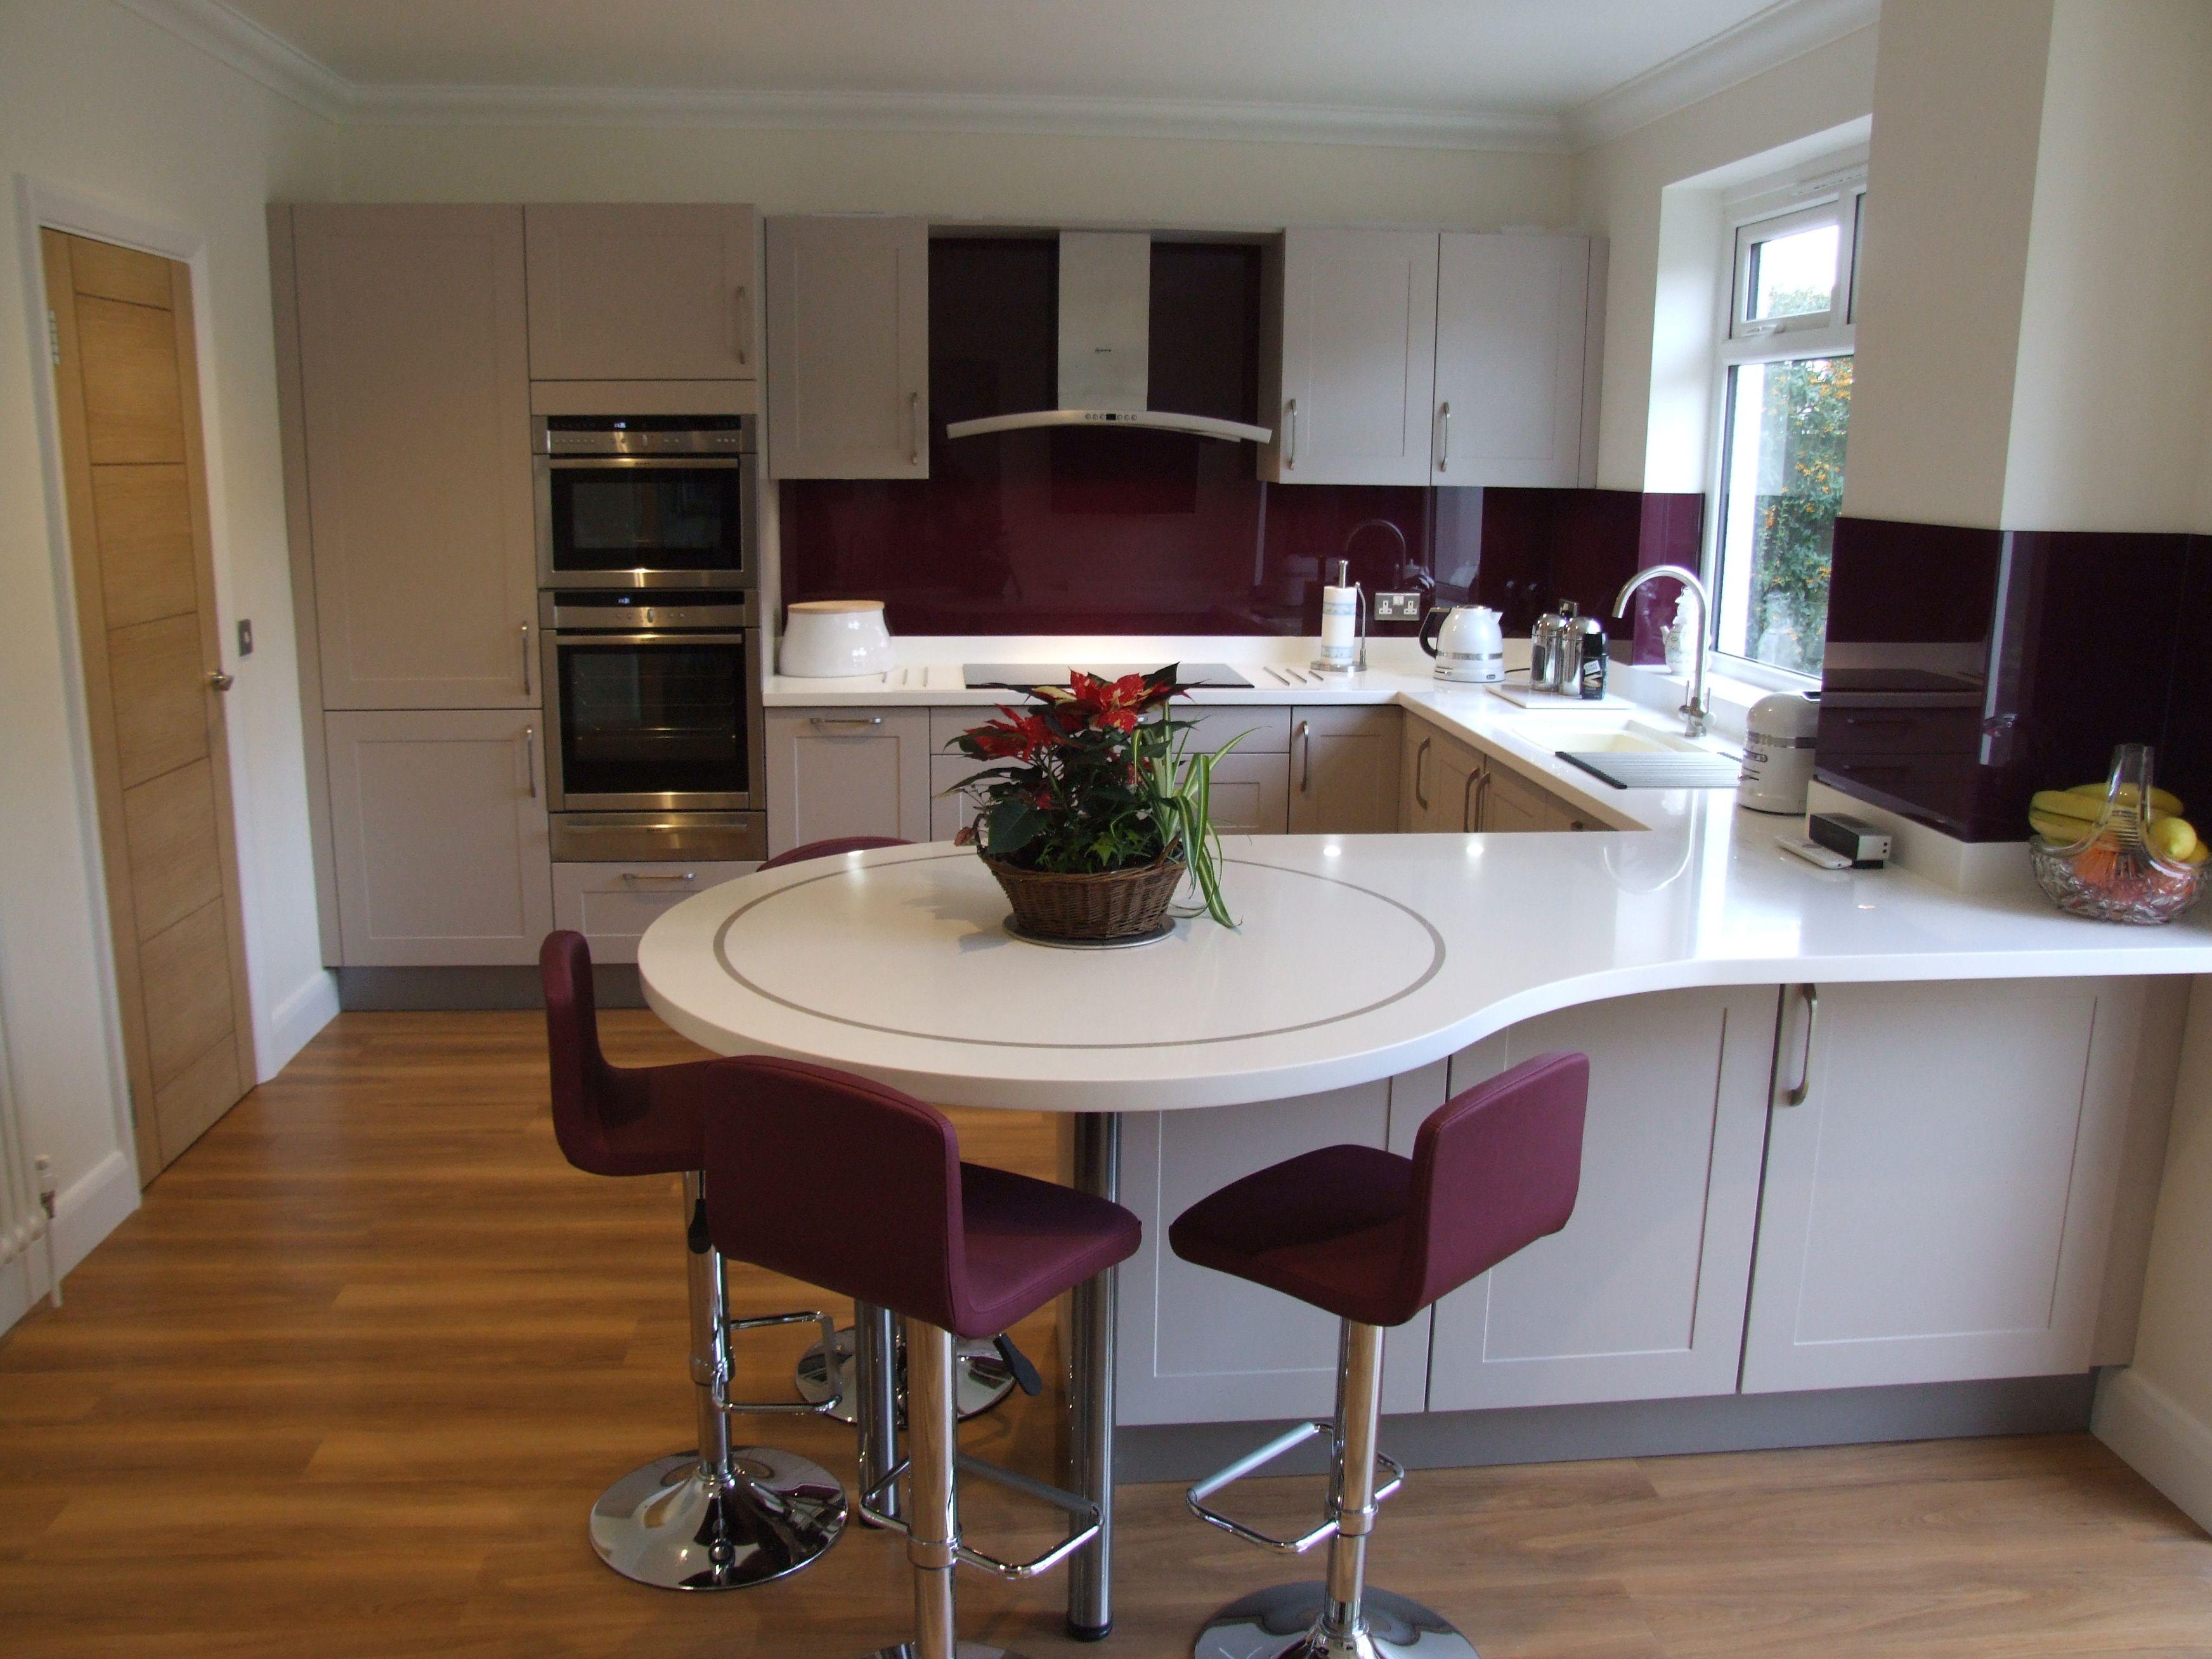 Modern Painted Kitchen With Lovely Circular Breakfast Bar Kitchen Ideas Pinterest